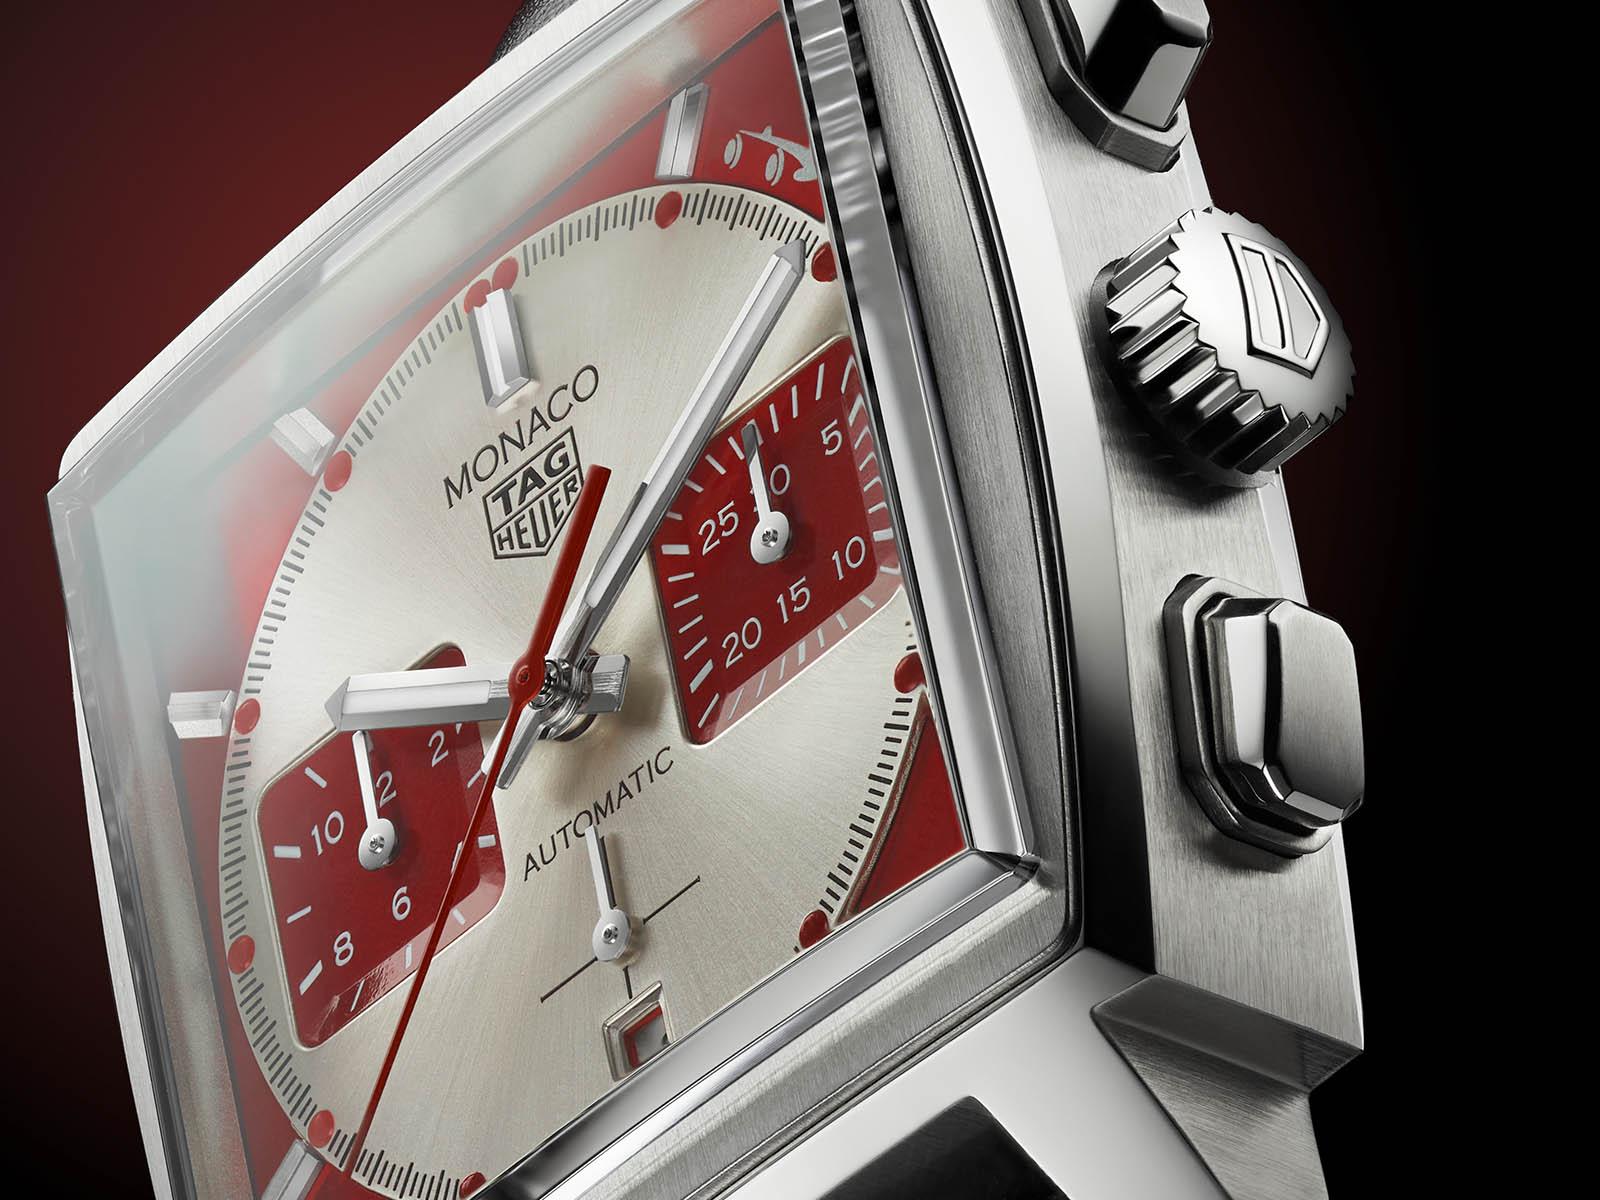 cbl2114-fc6486-tag-heuer-monaco-grand-prix-de-monaco-historique-limited-edition-6.jpg